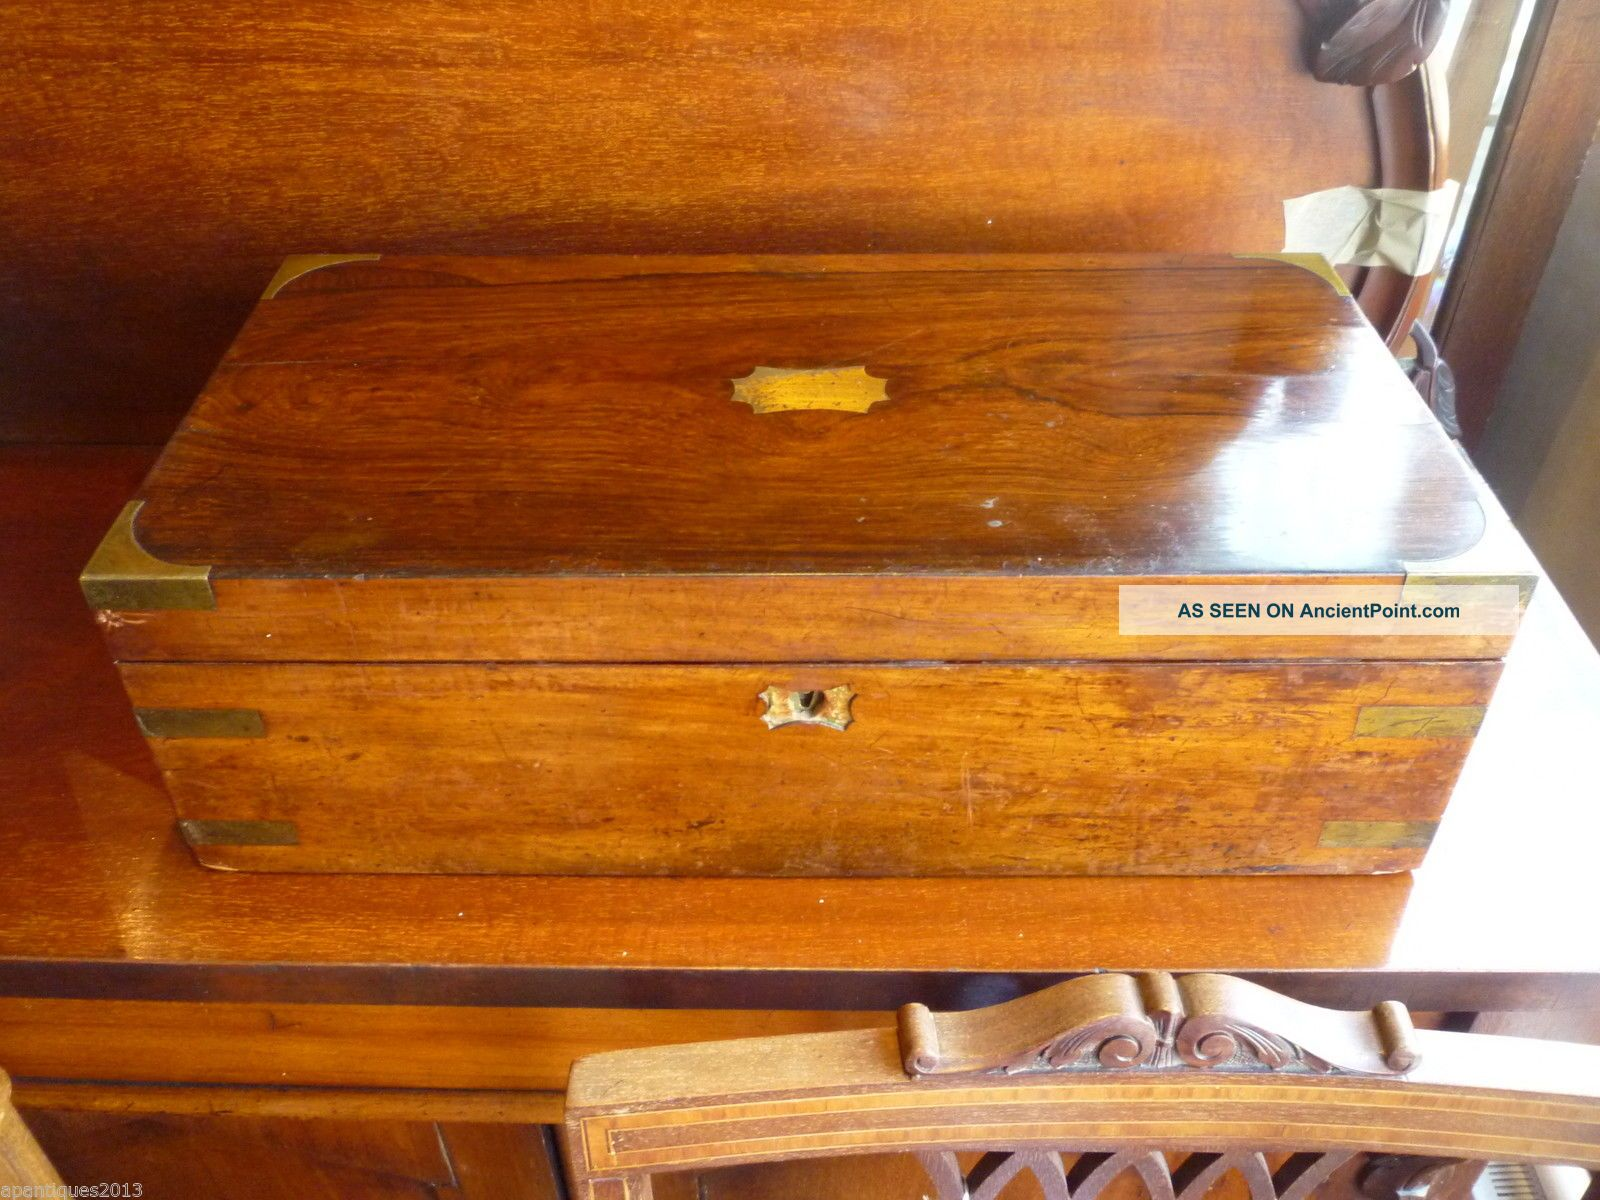 Large Antique Rosewood Brass Bound Writing Slope For Restoration Poss Secret Dra 1800-1899 photo